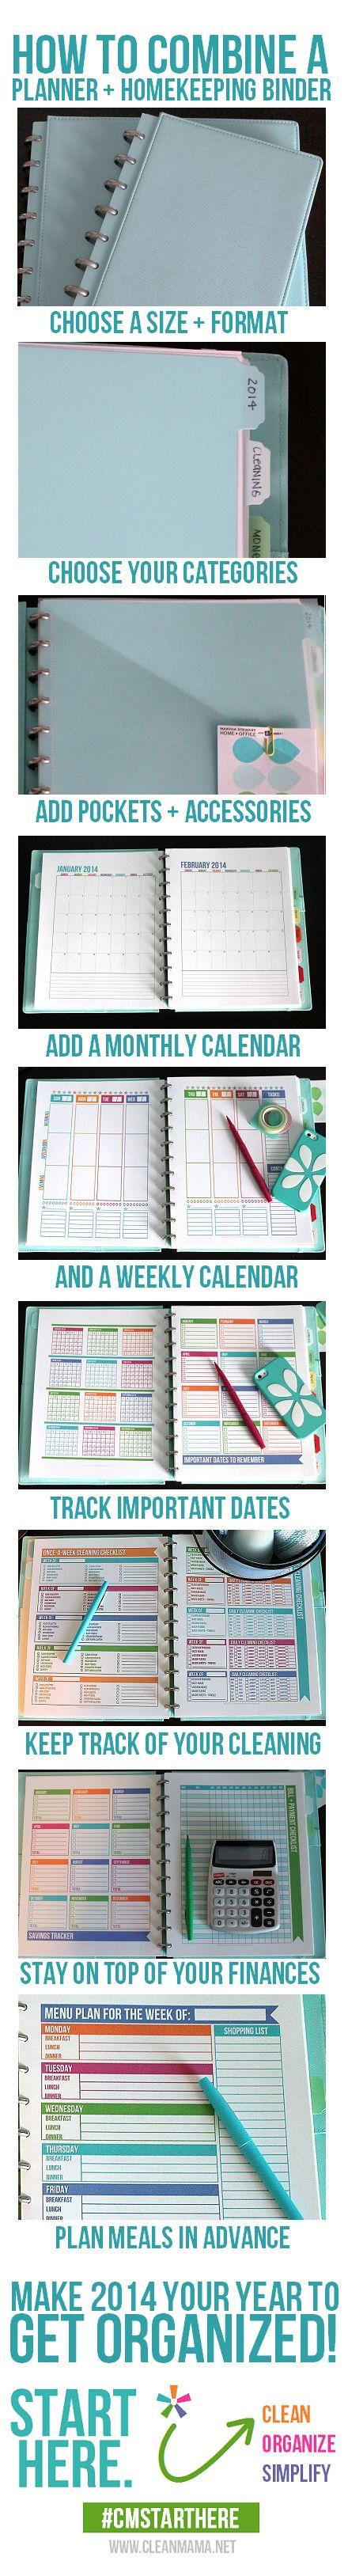 Start Here. Week 1 - Calendar + Bill Pay (How to Combine Your Planner + Homekeeping Binder) - Clean Mama